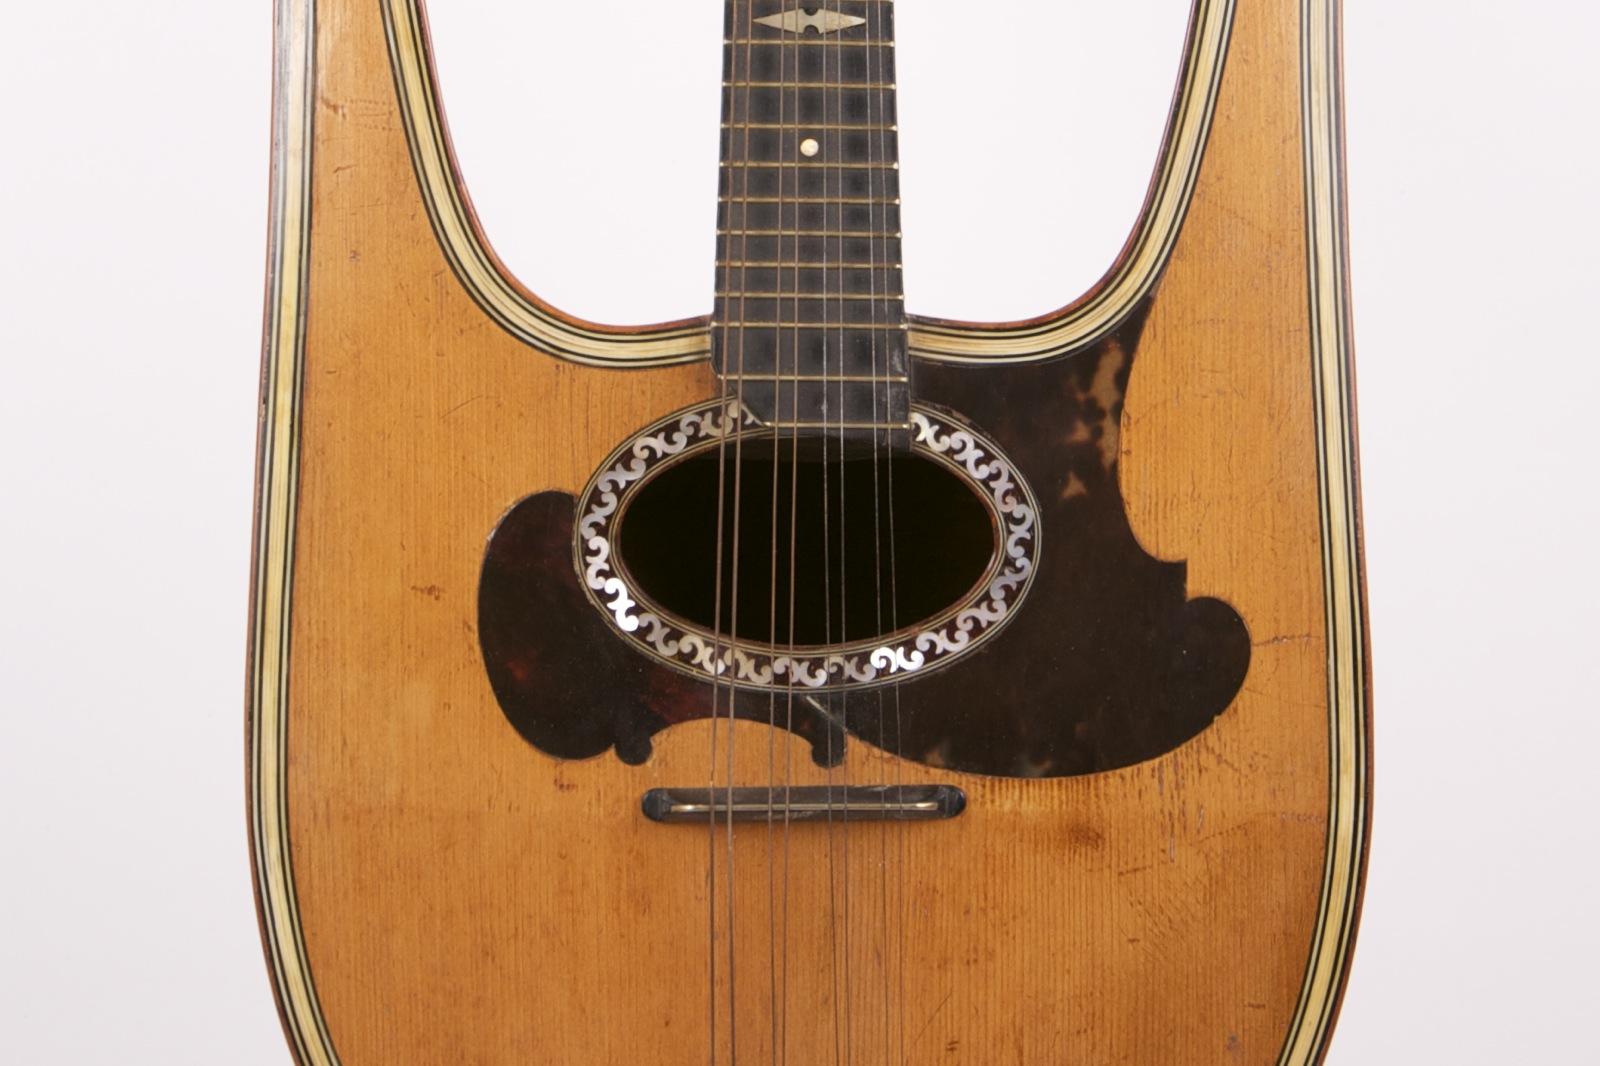 1897-mandoline-Raffaele-Calace-03